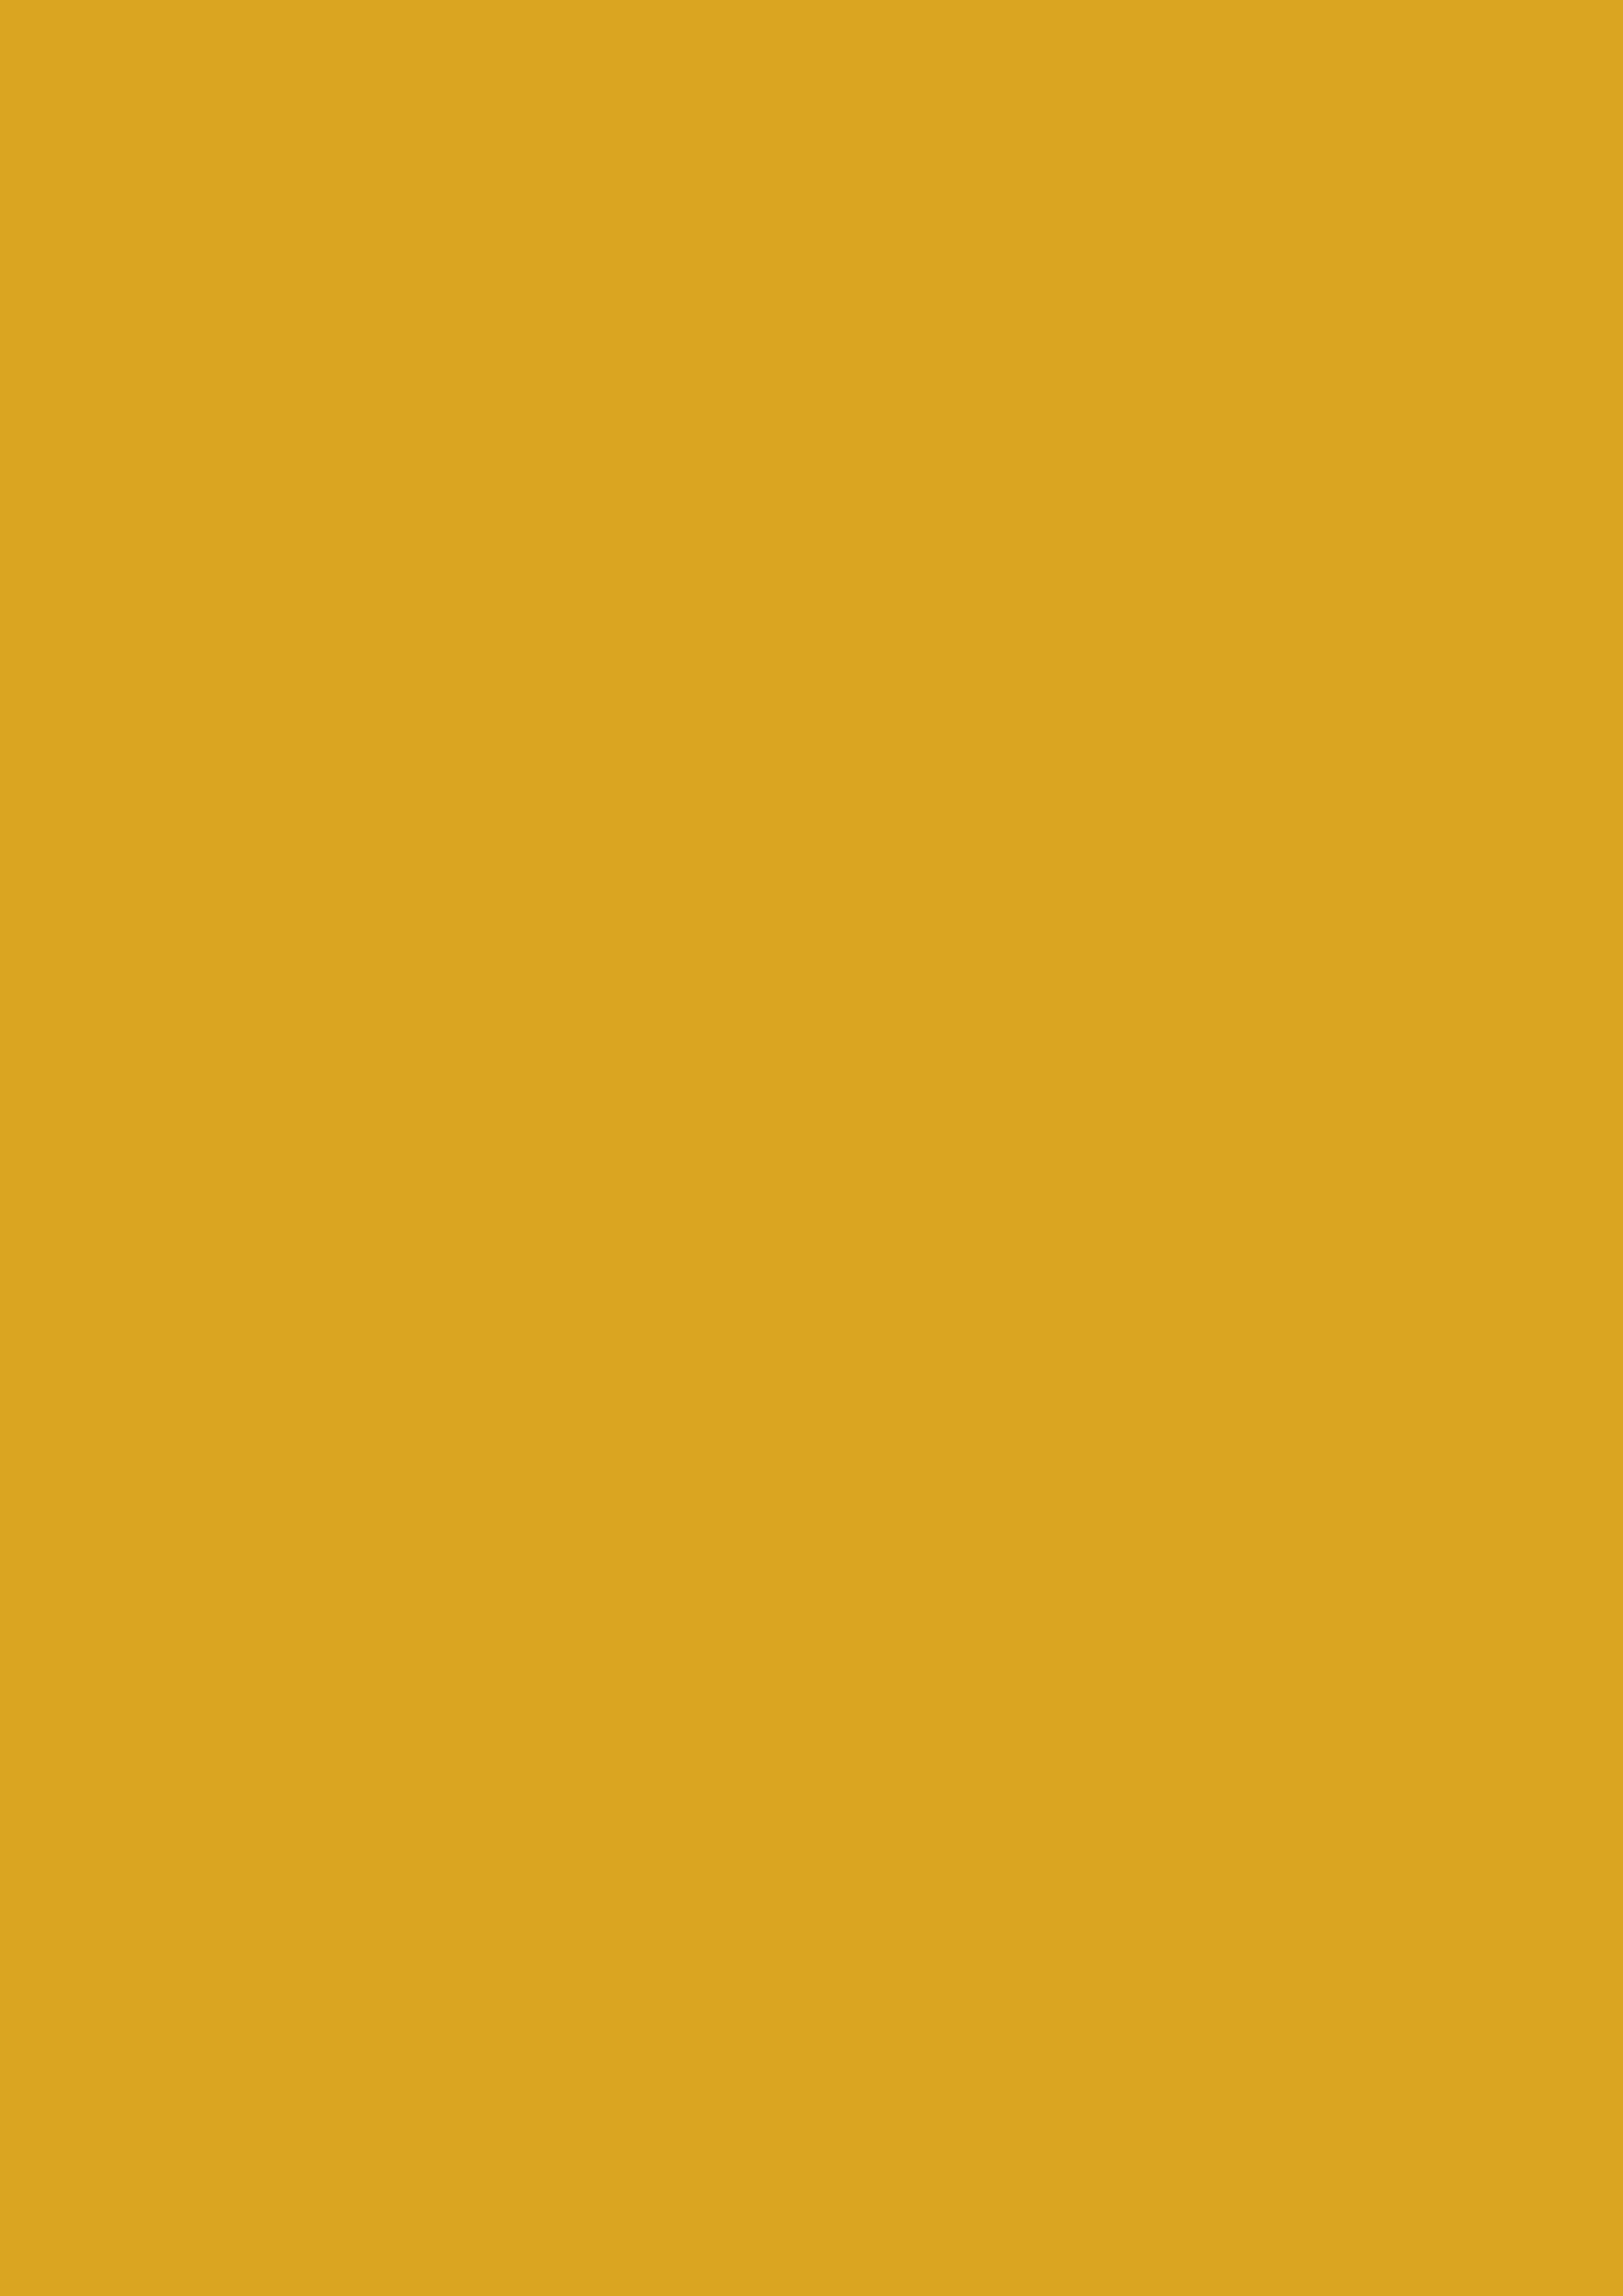 2480x3508 Goldenrod Solid Color Background